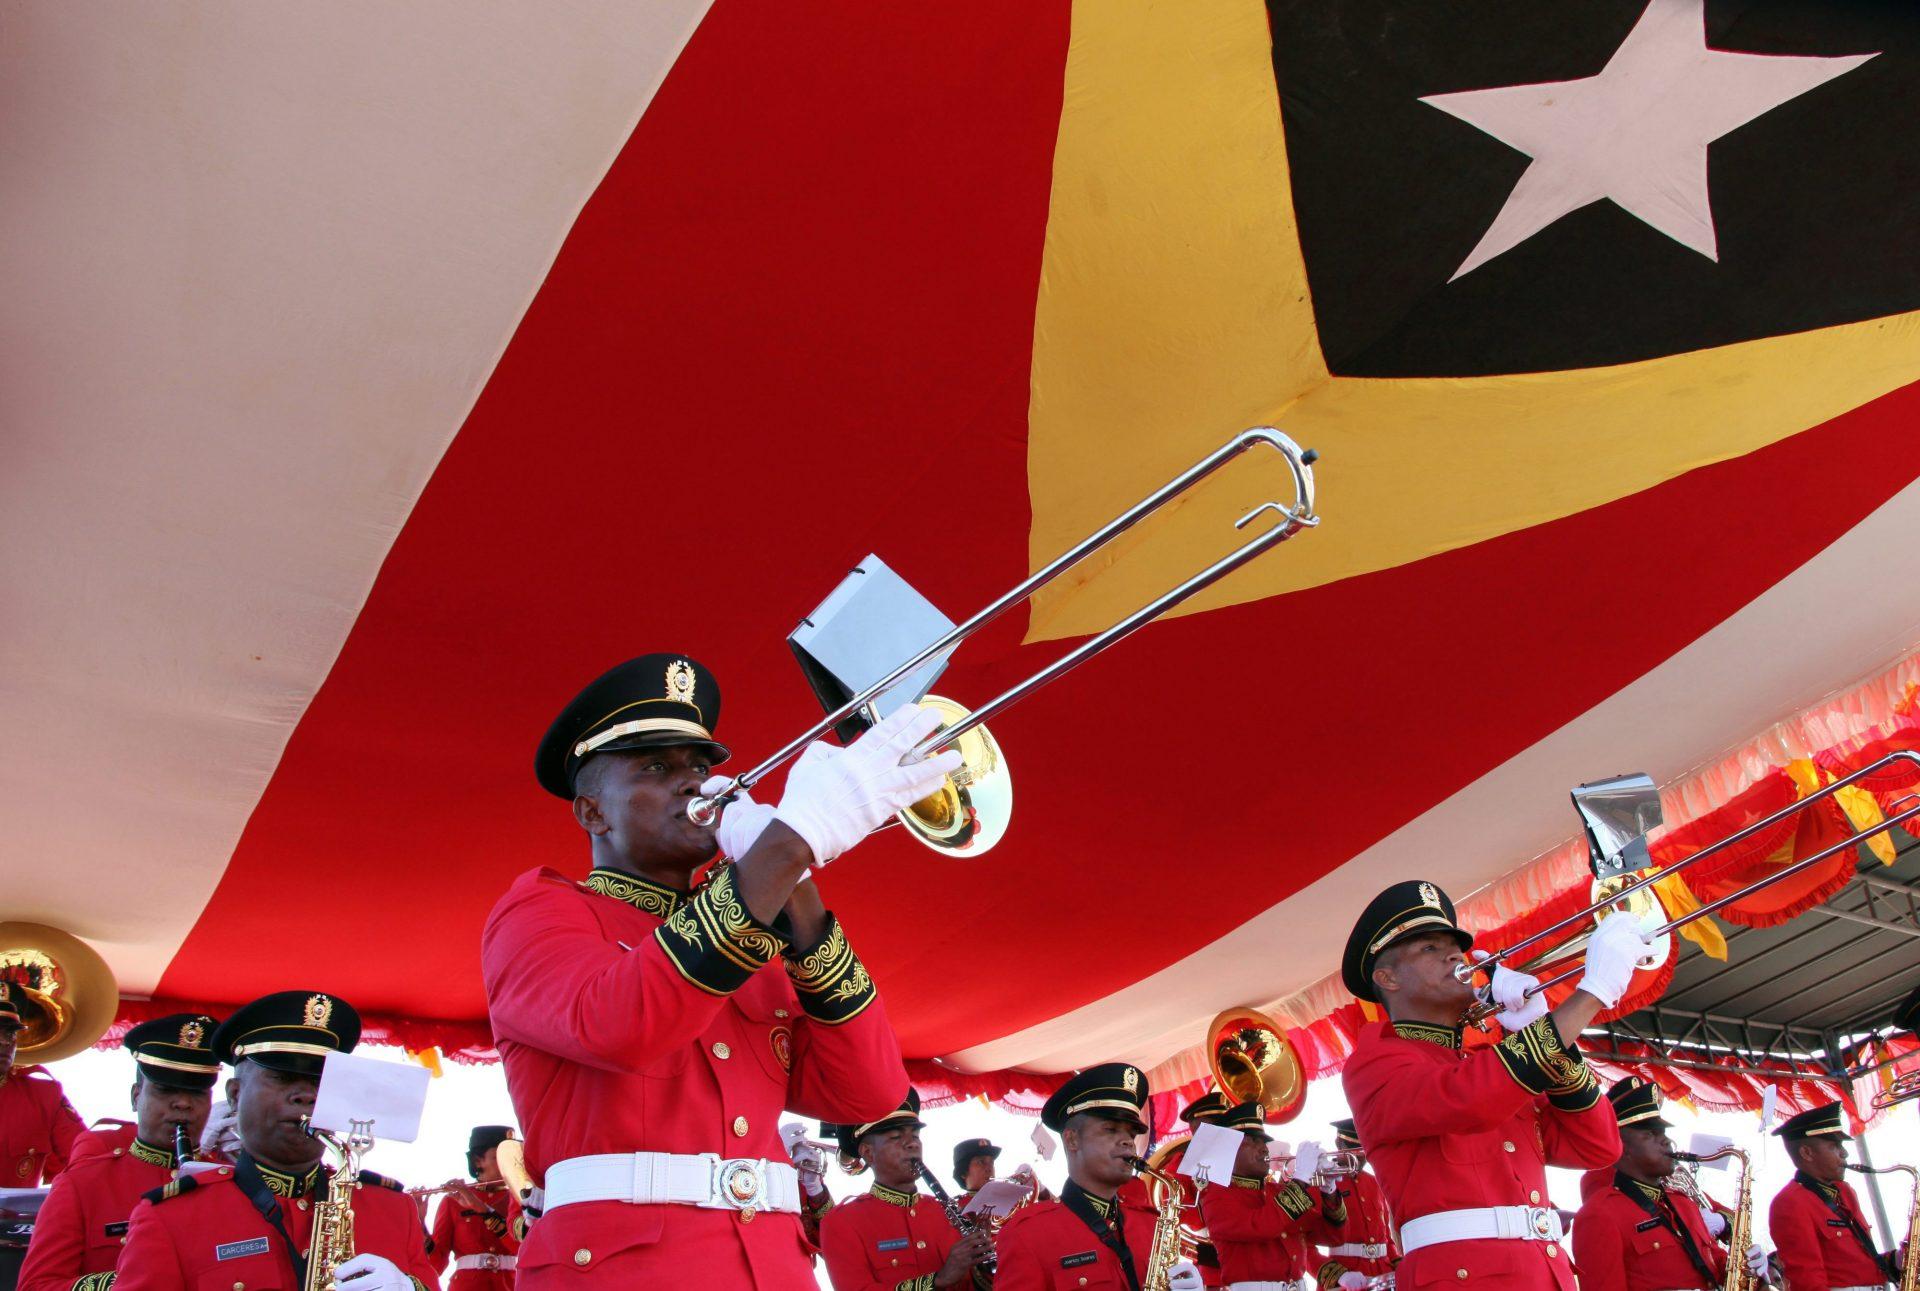 Governo timorense e União de Exportadores da CPLP